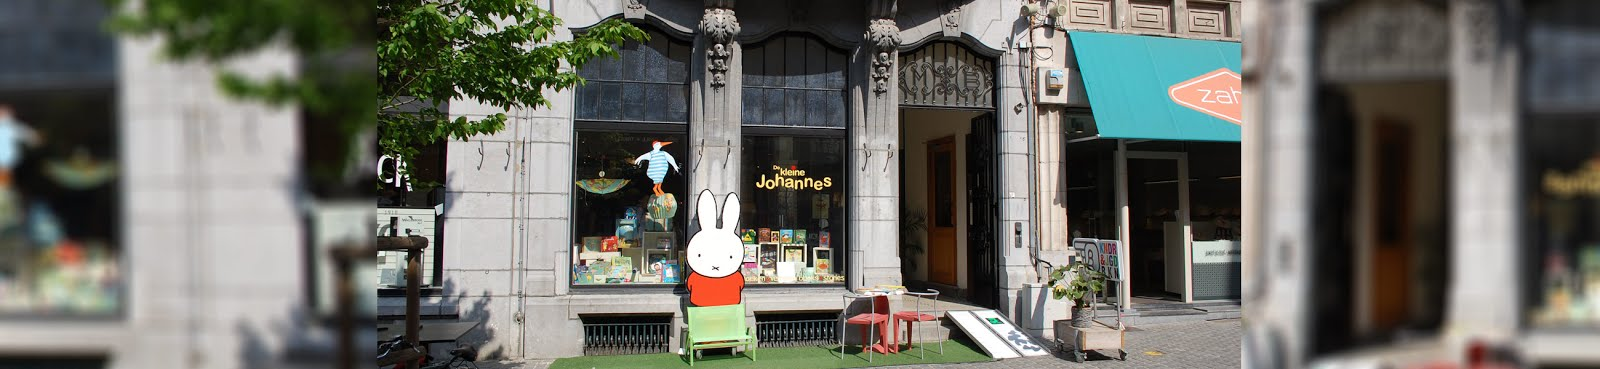 Boekhandel De kleine Johannes